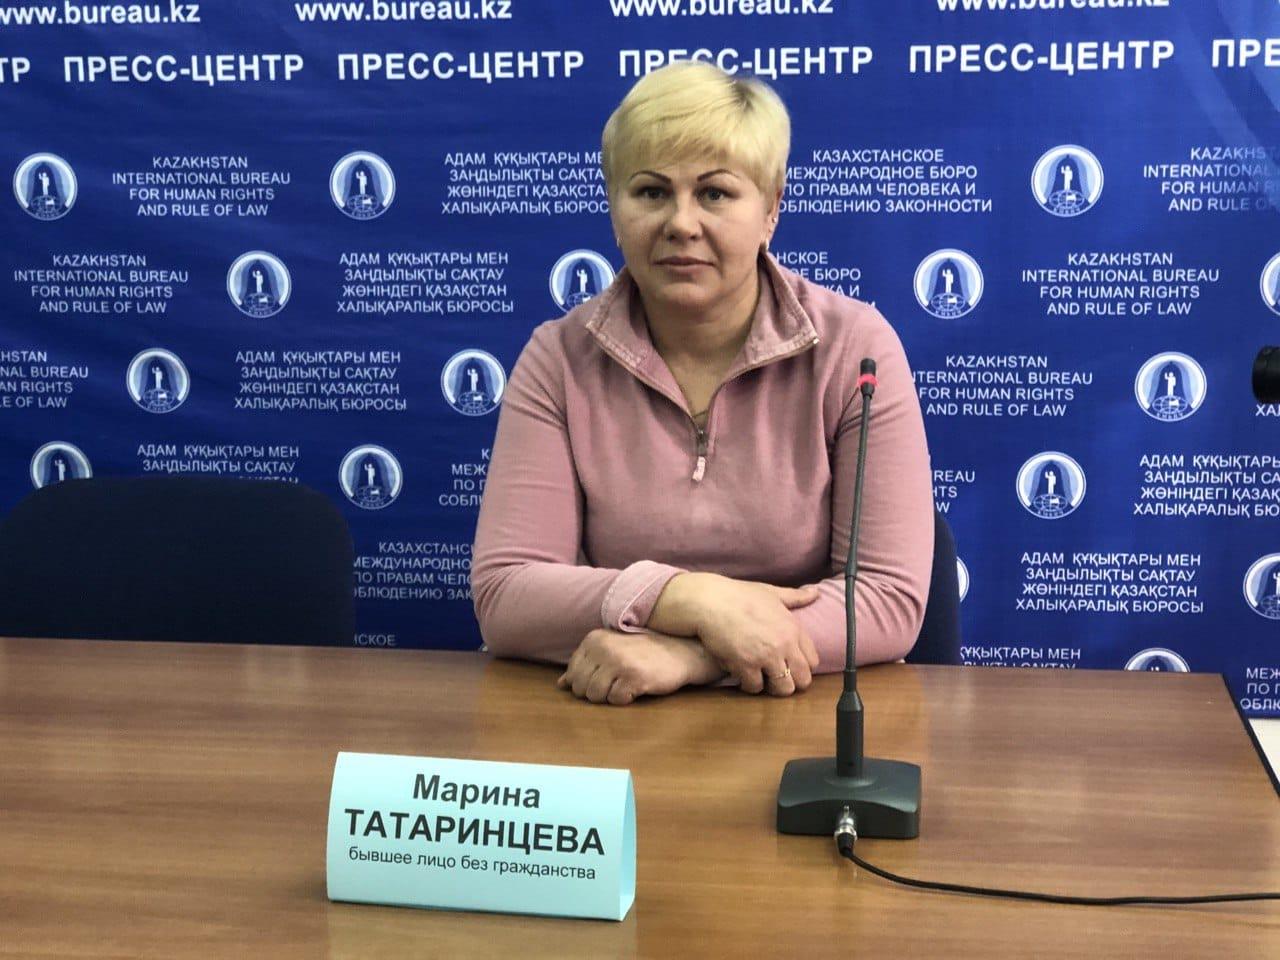 Марина Татаринцева